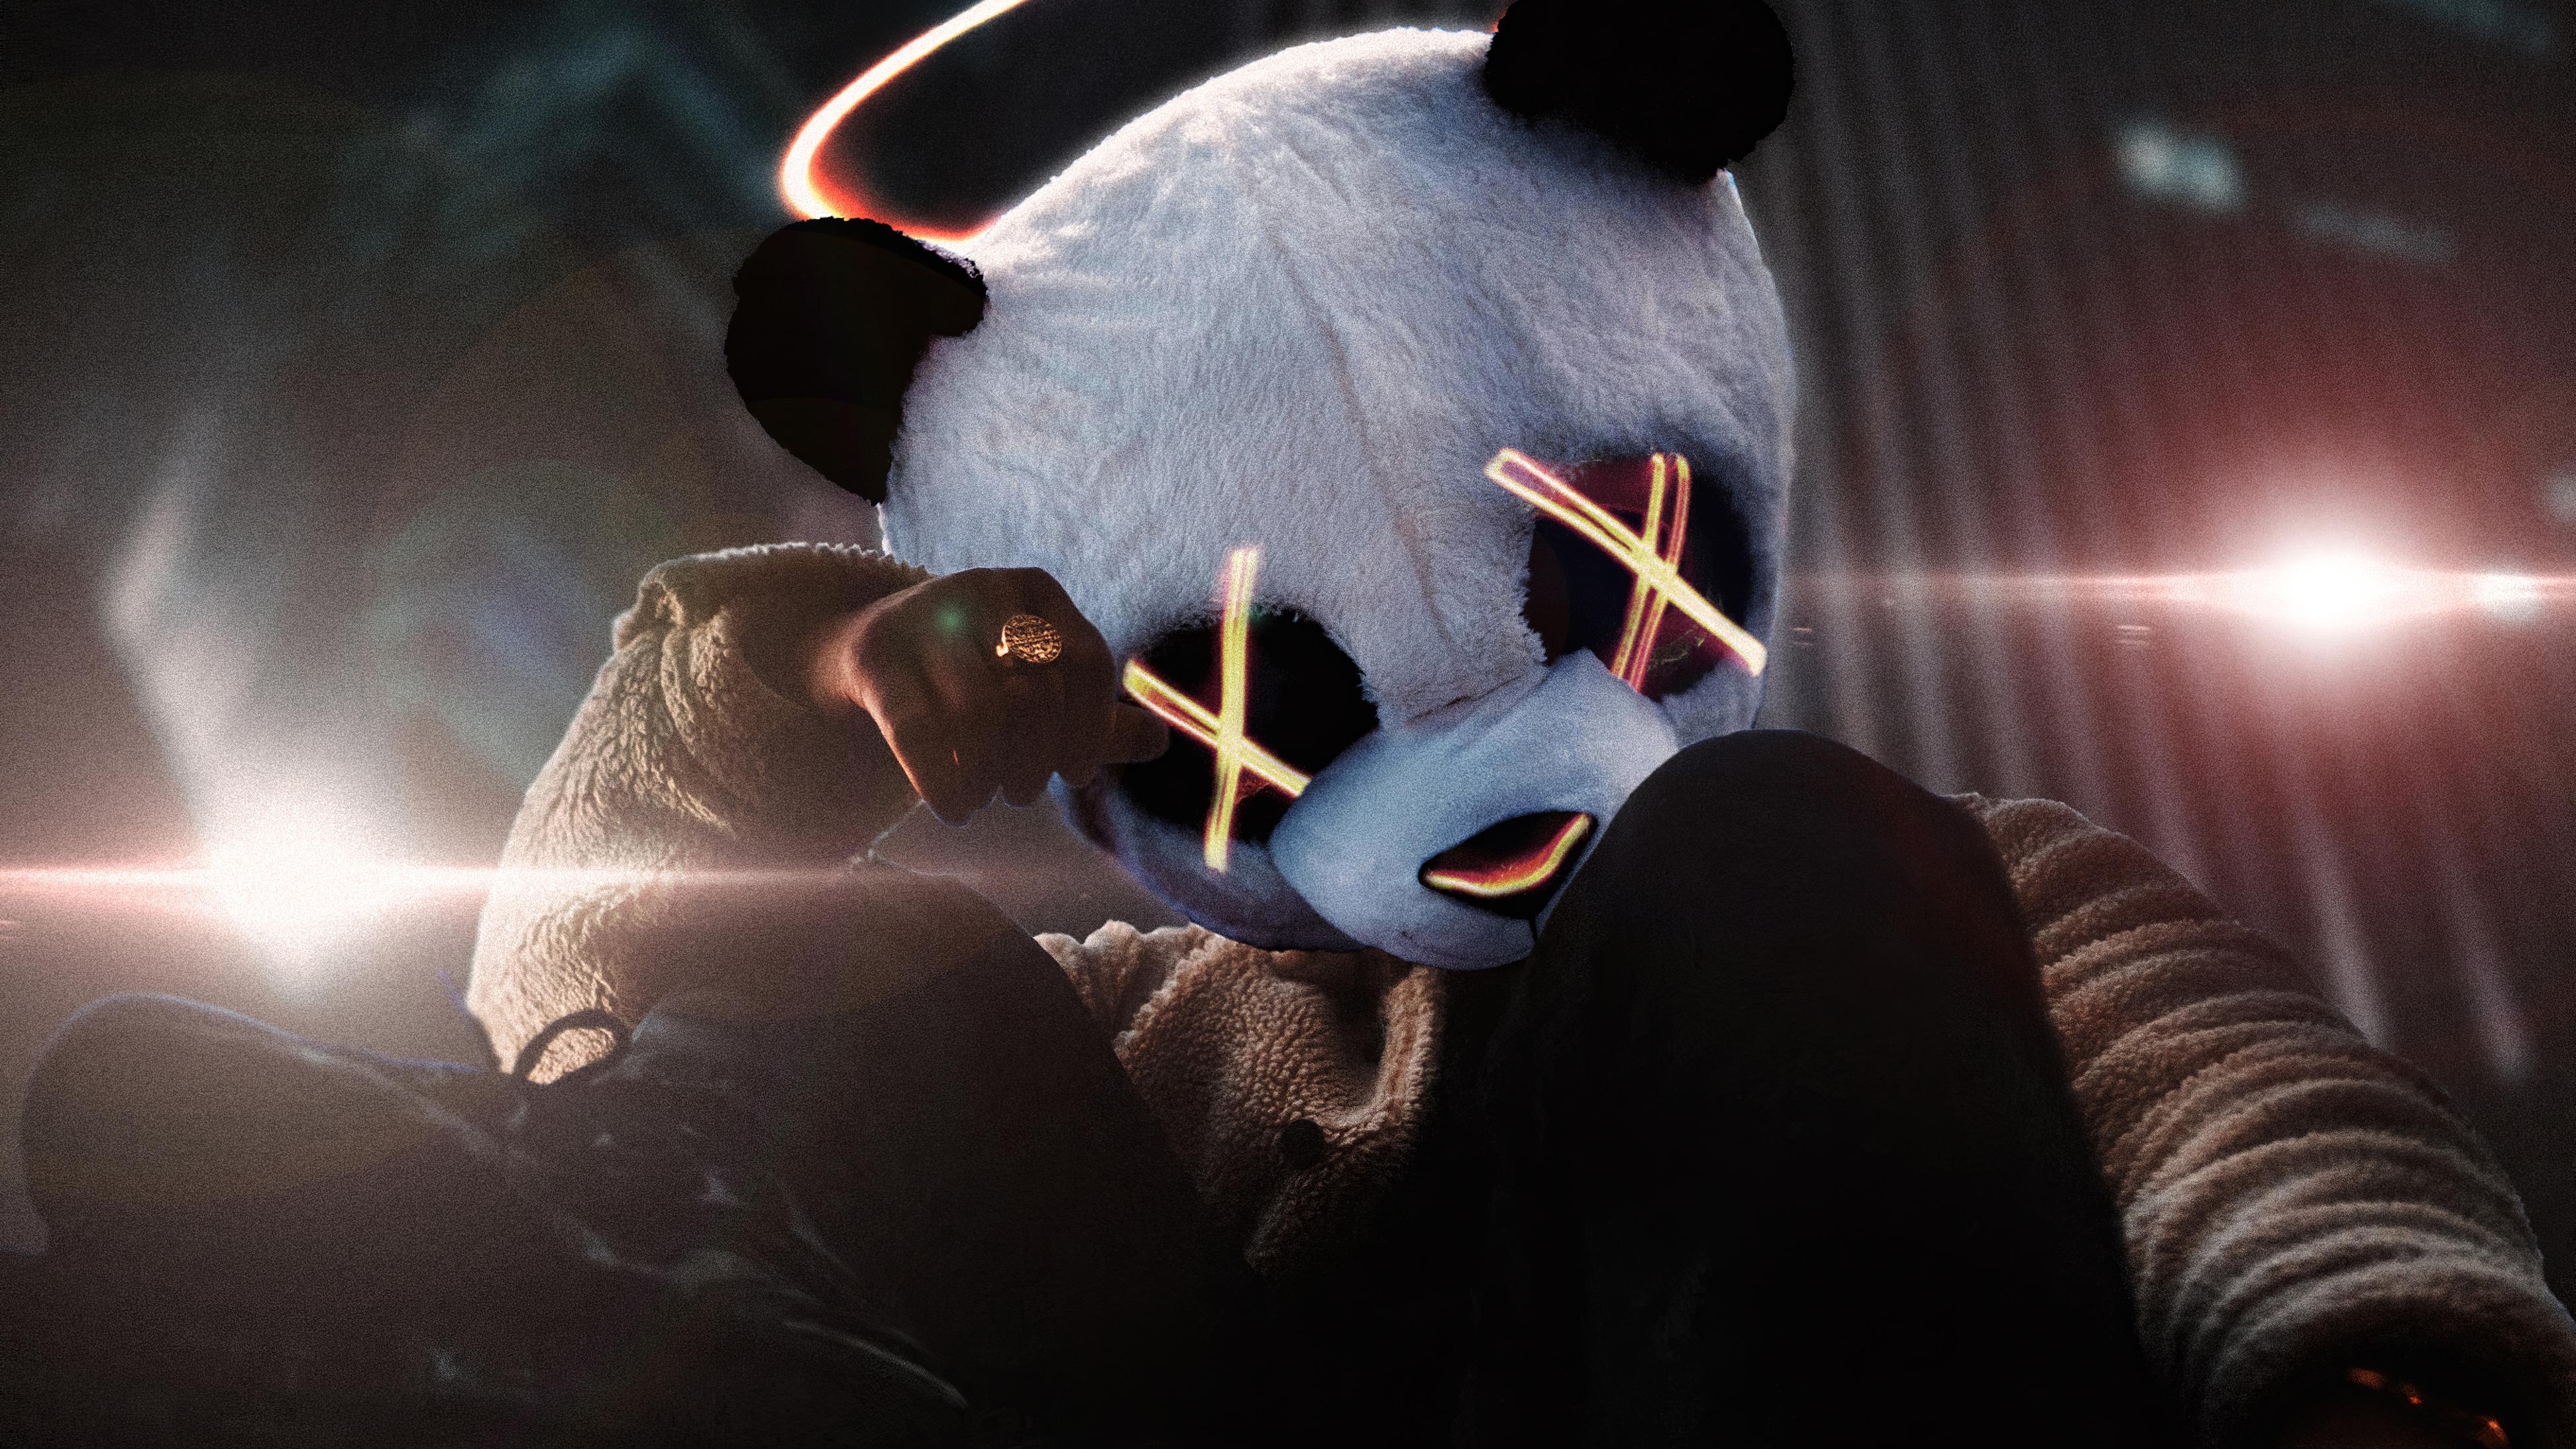 mafia panda 1578254752 - Mafia Panda -